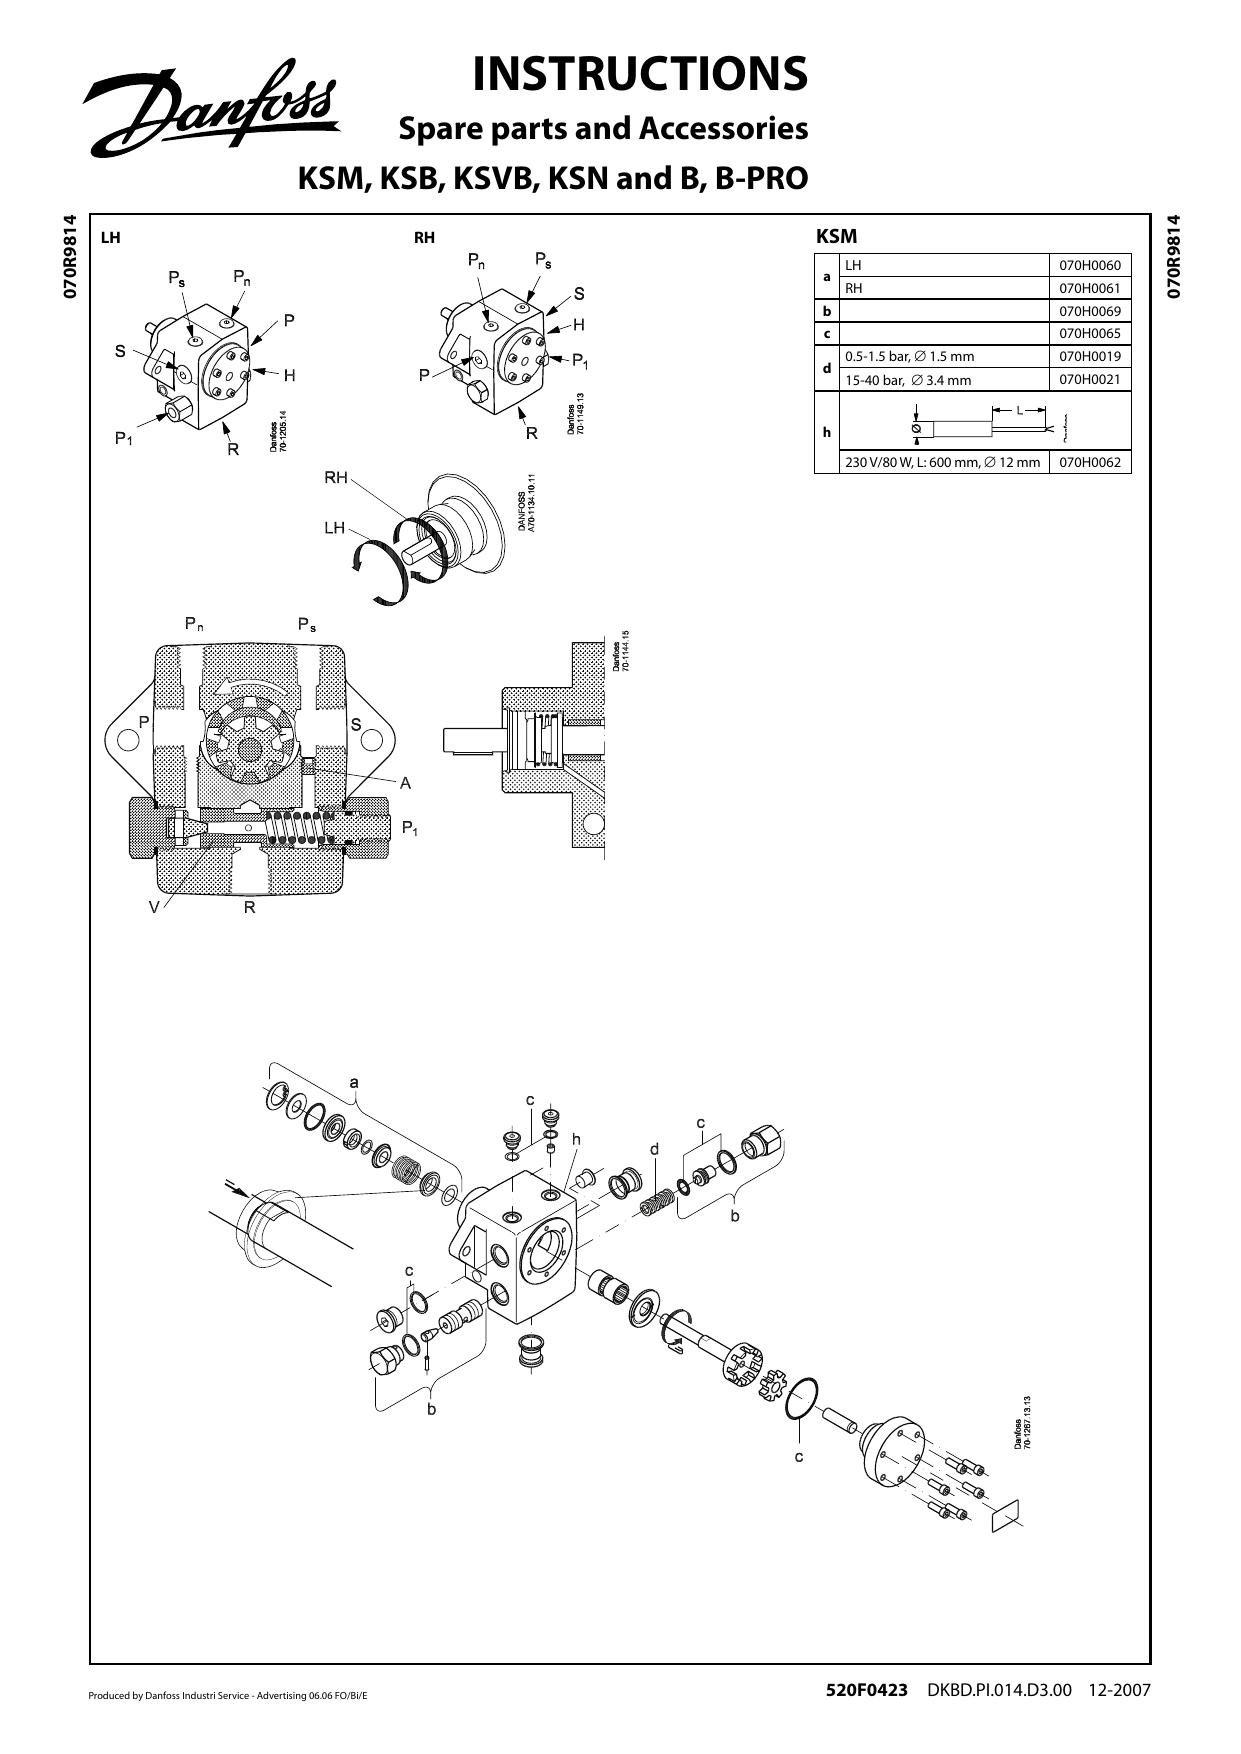 Danfoss Oil Pump Ksm Spare Parts And Accessories 安装指南 Manualzz